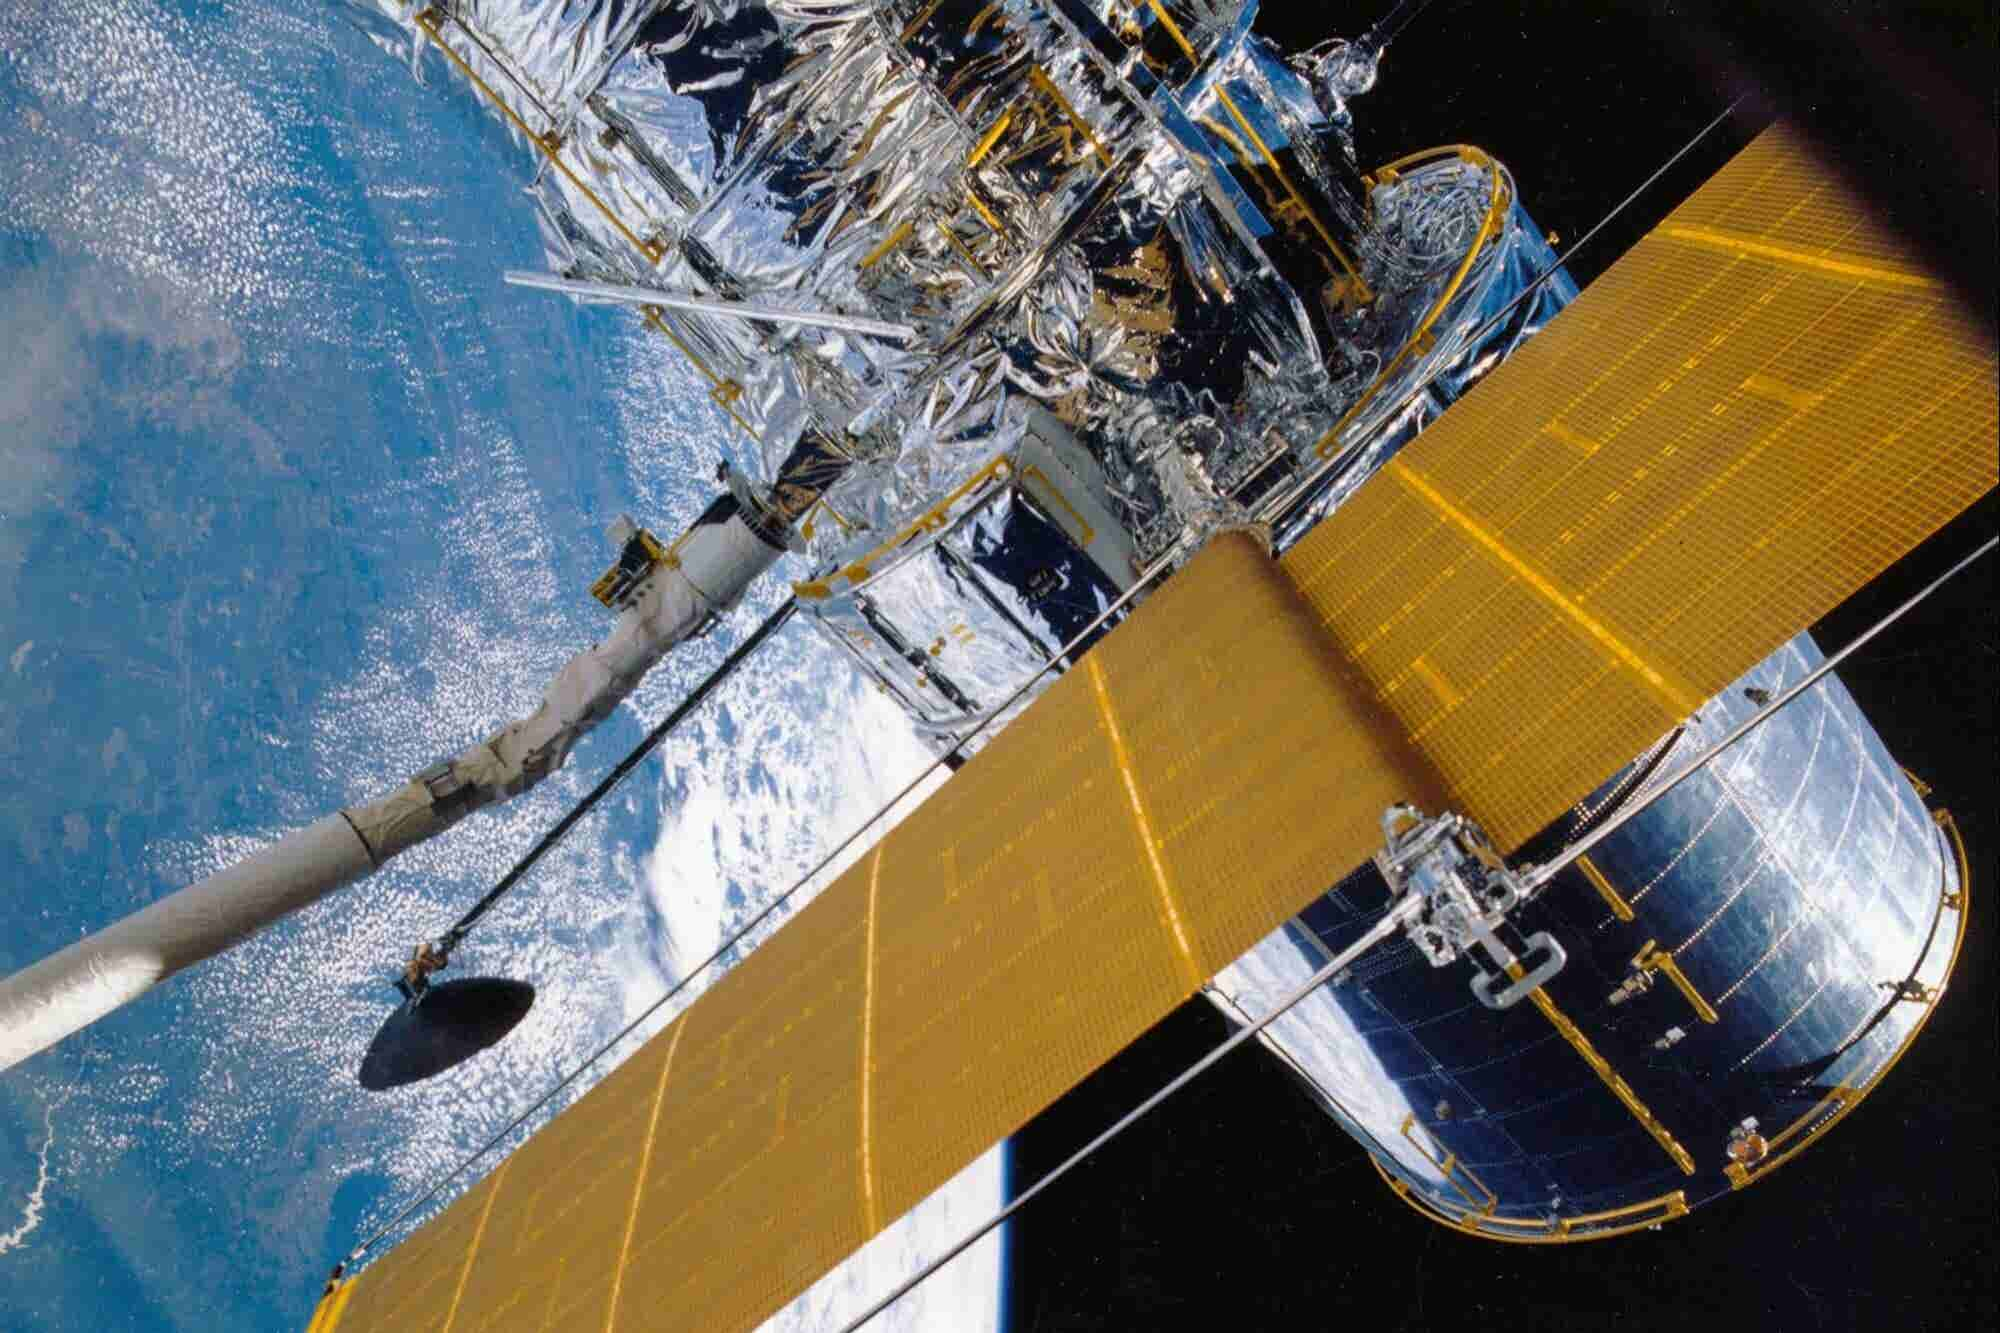 Singapore's Astroscale Raises $30 Million Funding to Delete Space Junk